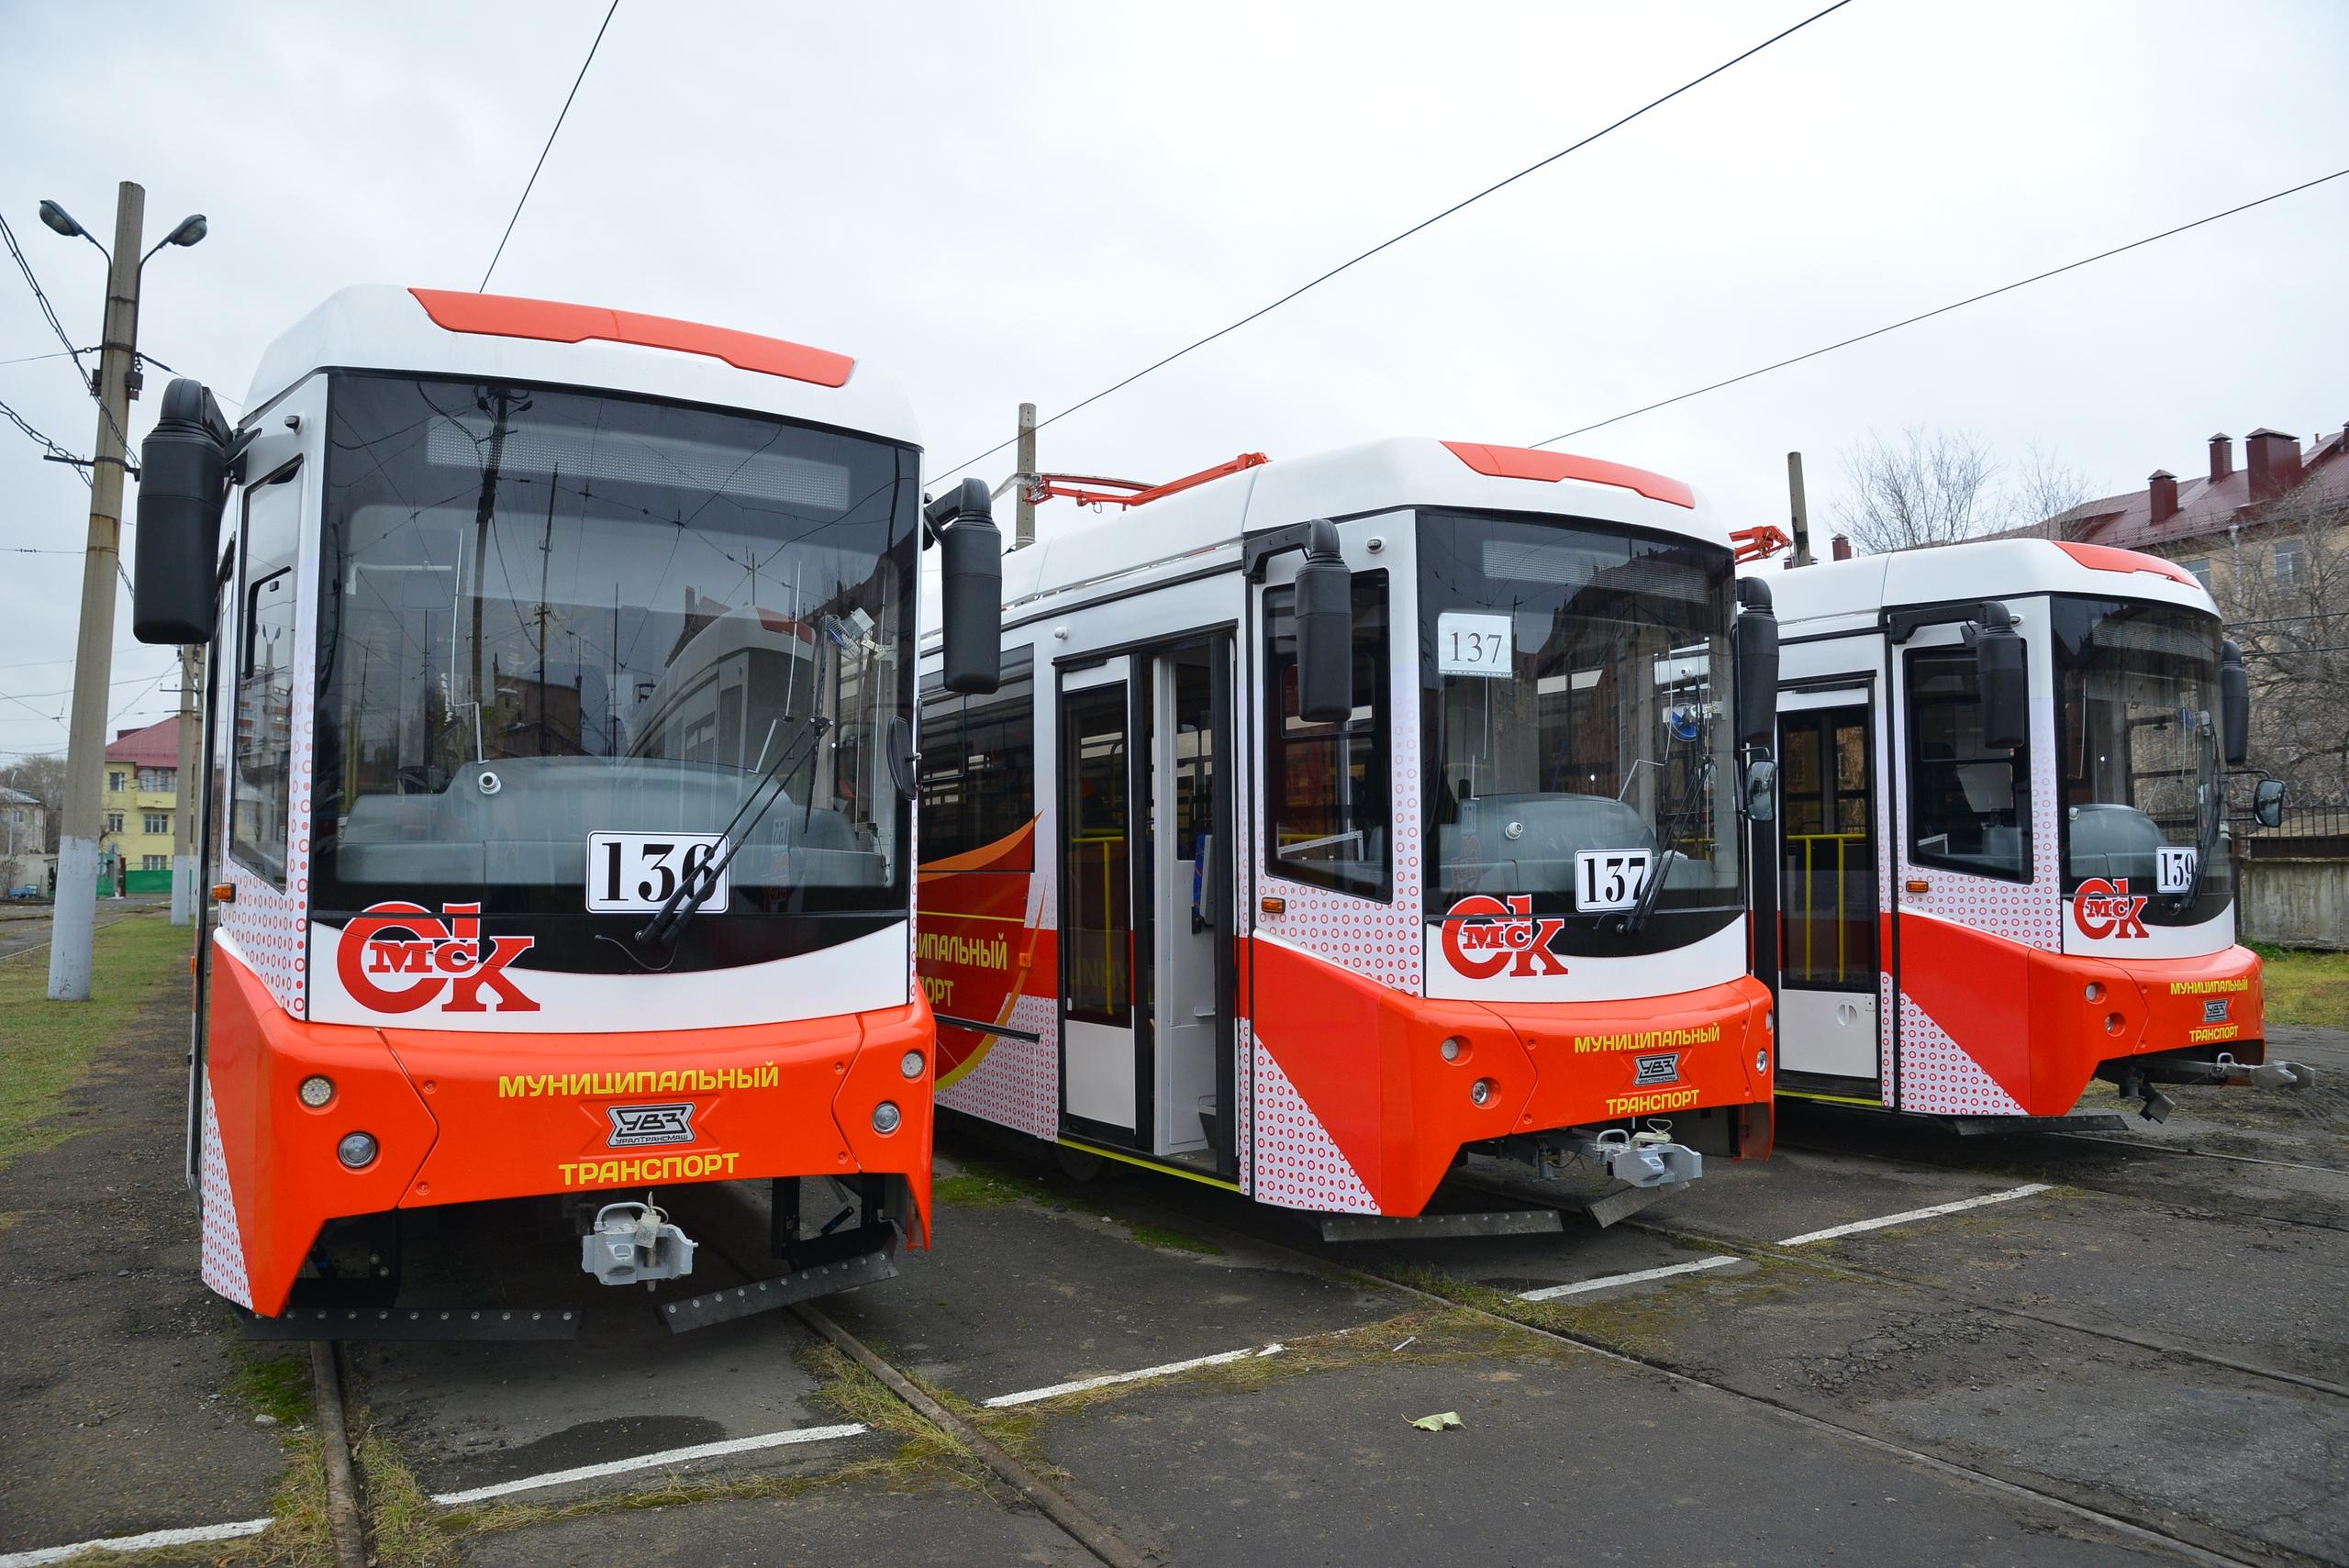 На Левобережье Омска хотят возродить трамваи и пустить троллейбусы до «Меги» #Новости #Общество #Омск